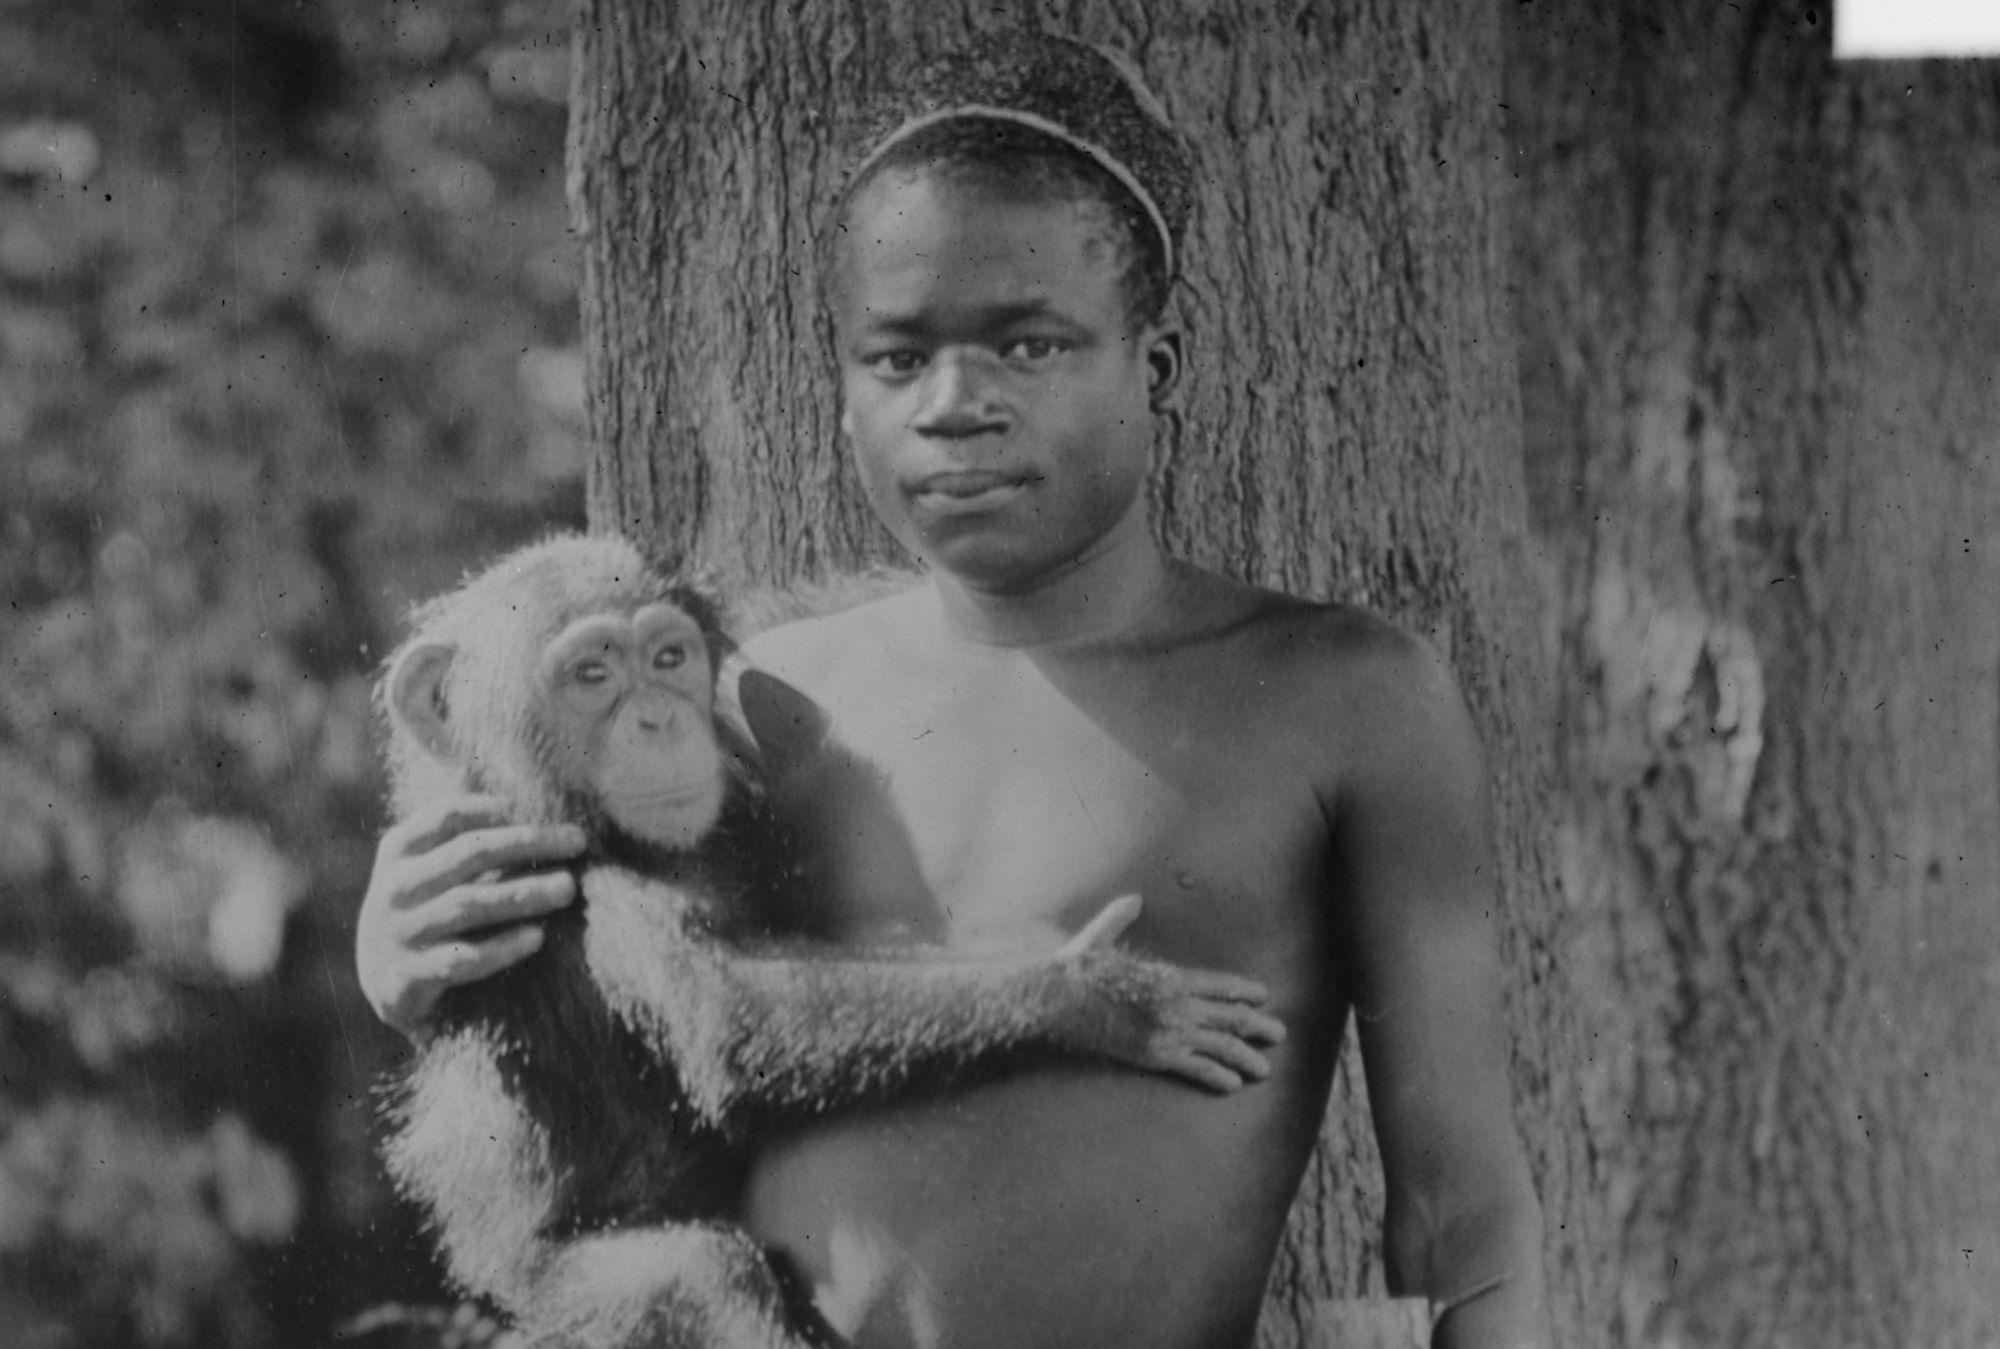 Ota Benga: The Black Man the Bronx Zoo Put on Display In 1906 ...